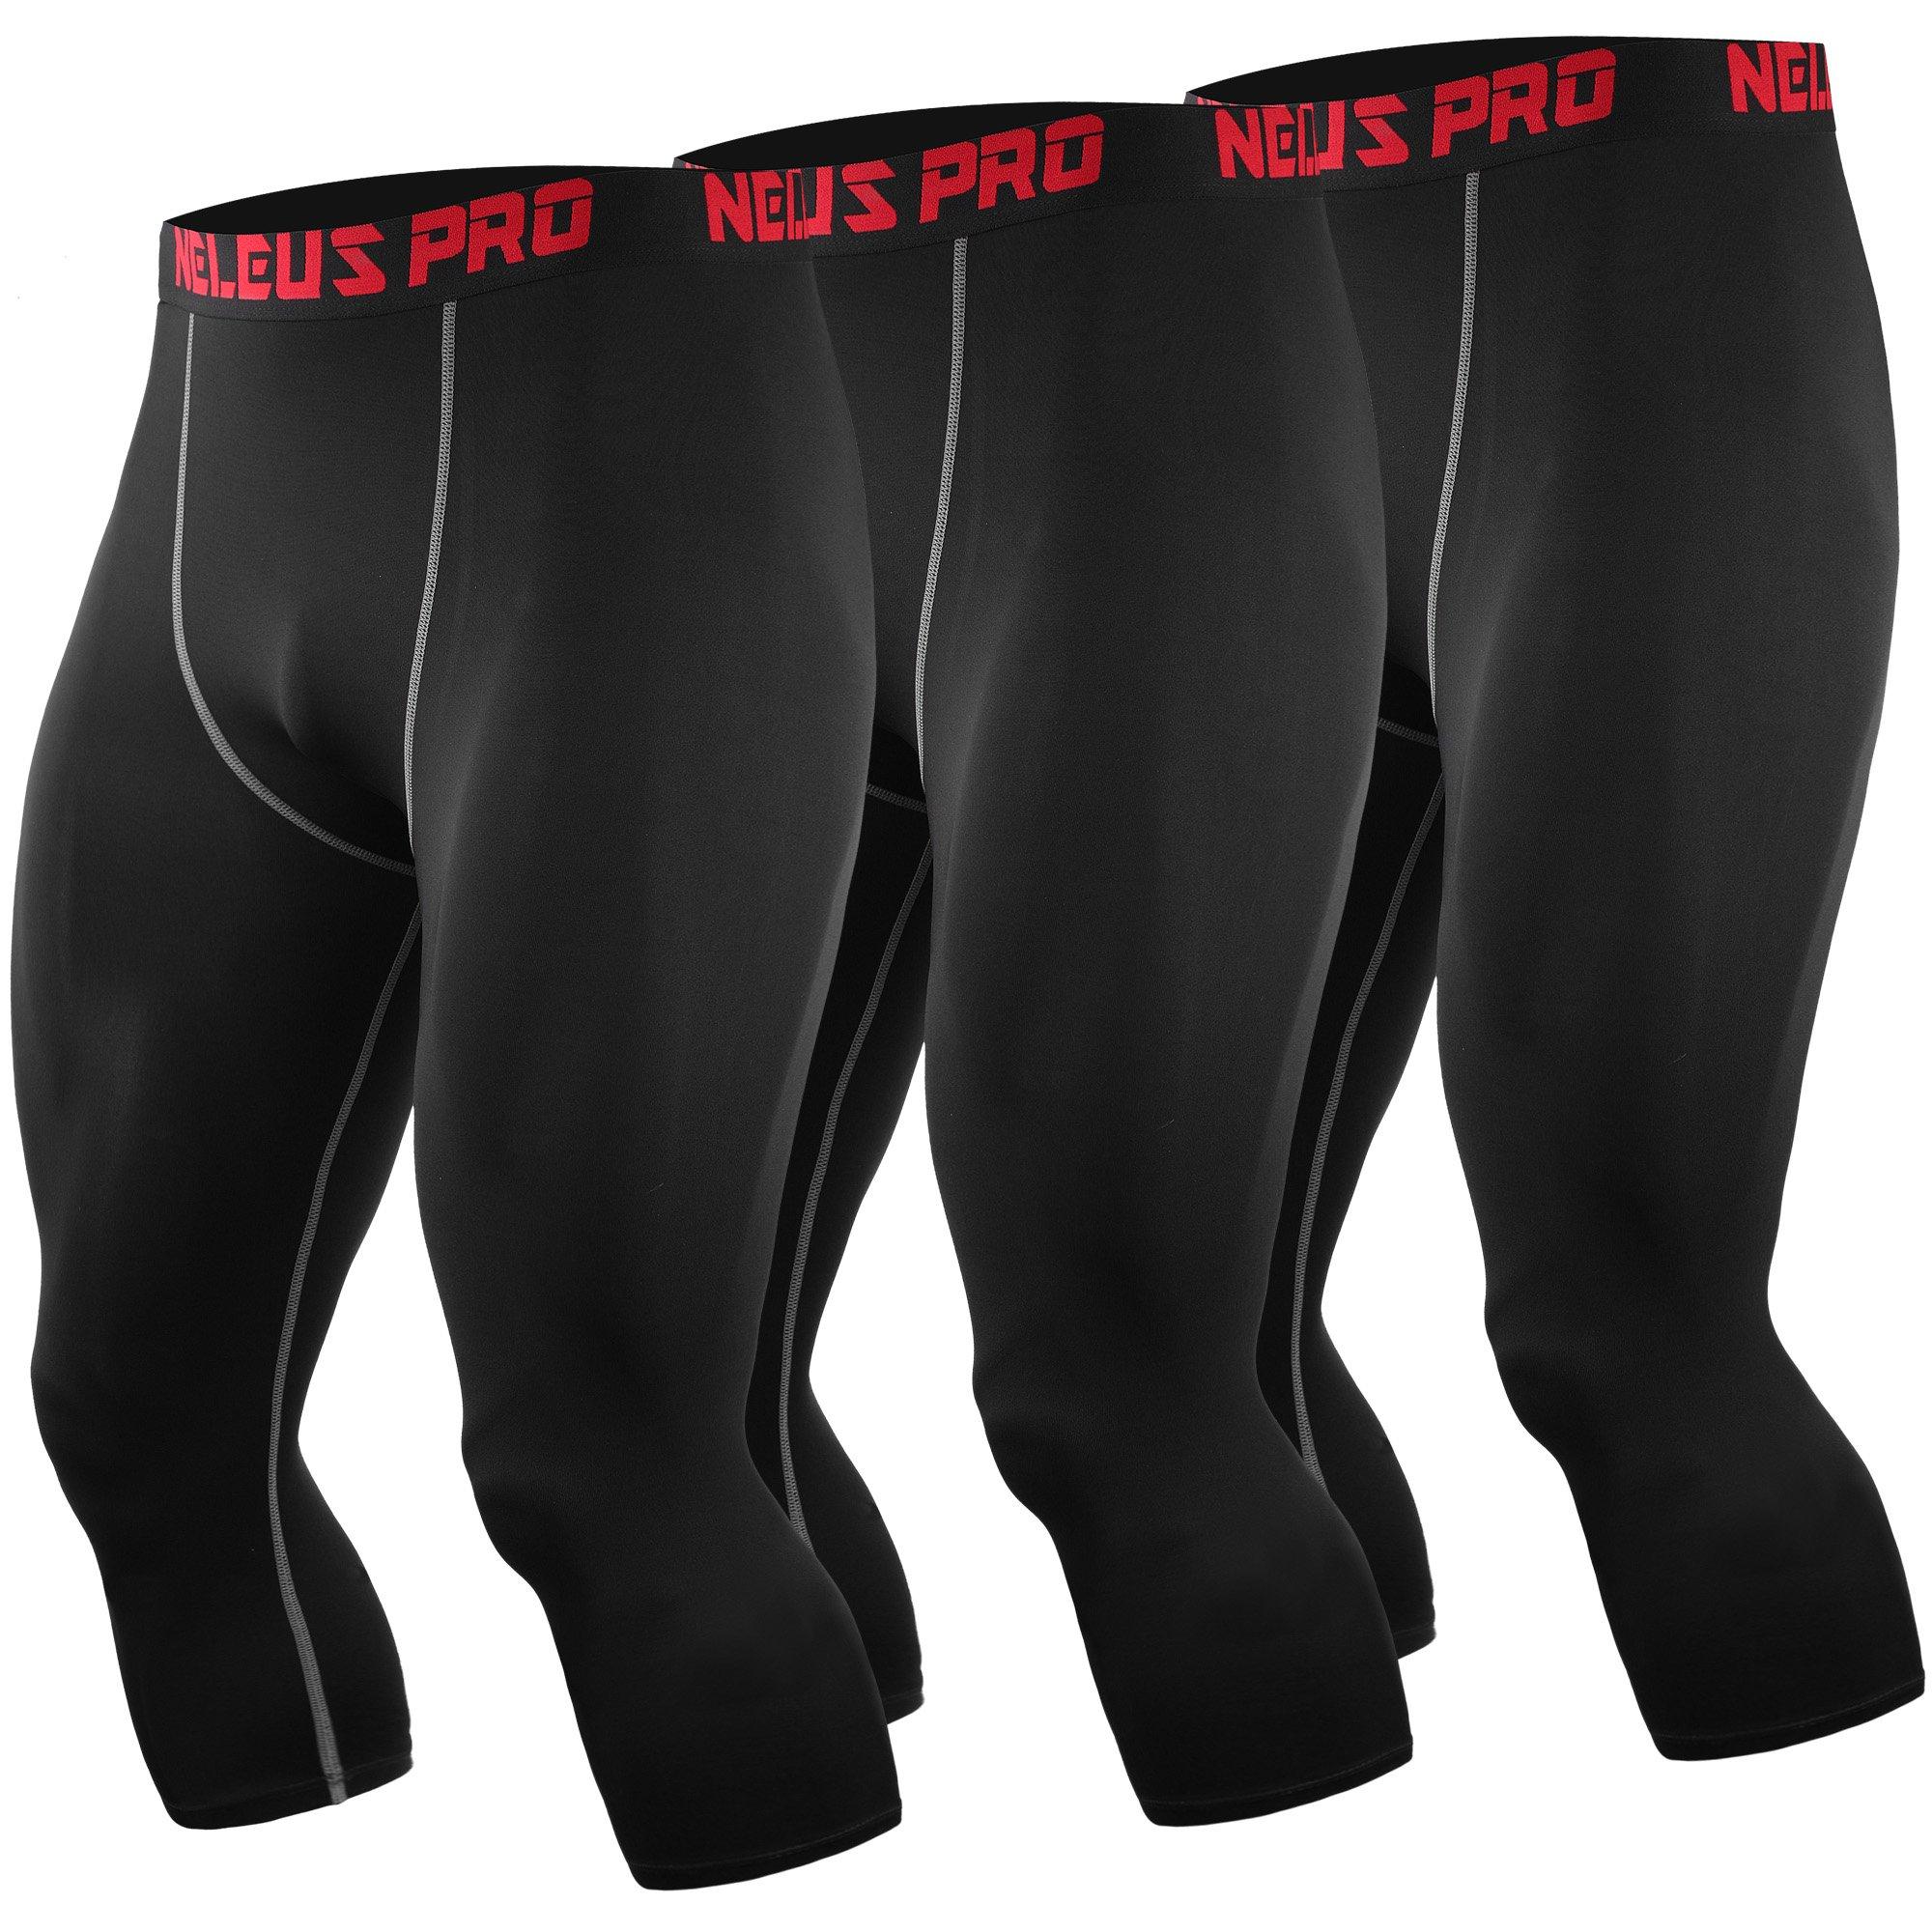 Neleus Men's Compression 3/4 Capri Running Leggings Sports Tights,6057,Black (Grey Stripe),S,EU M